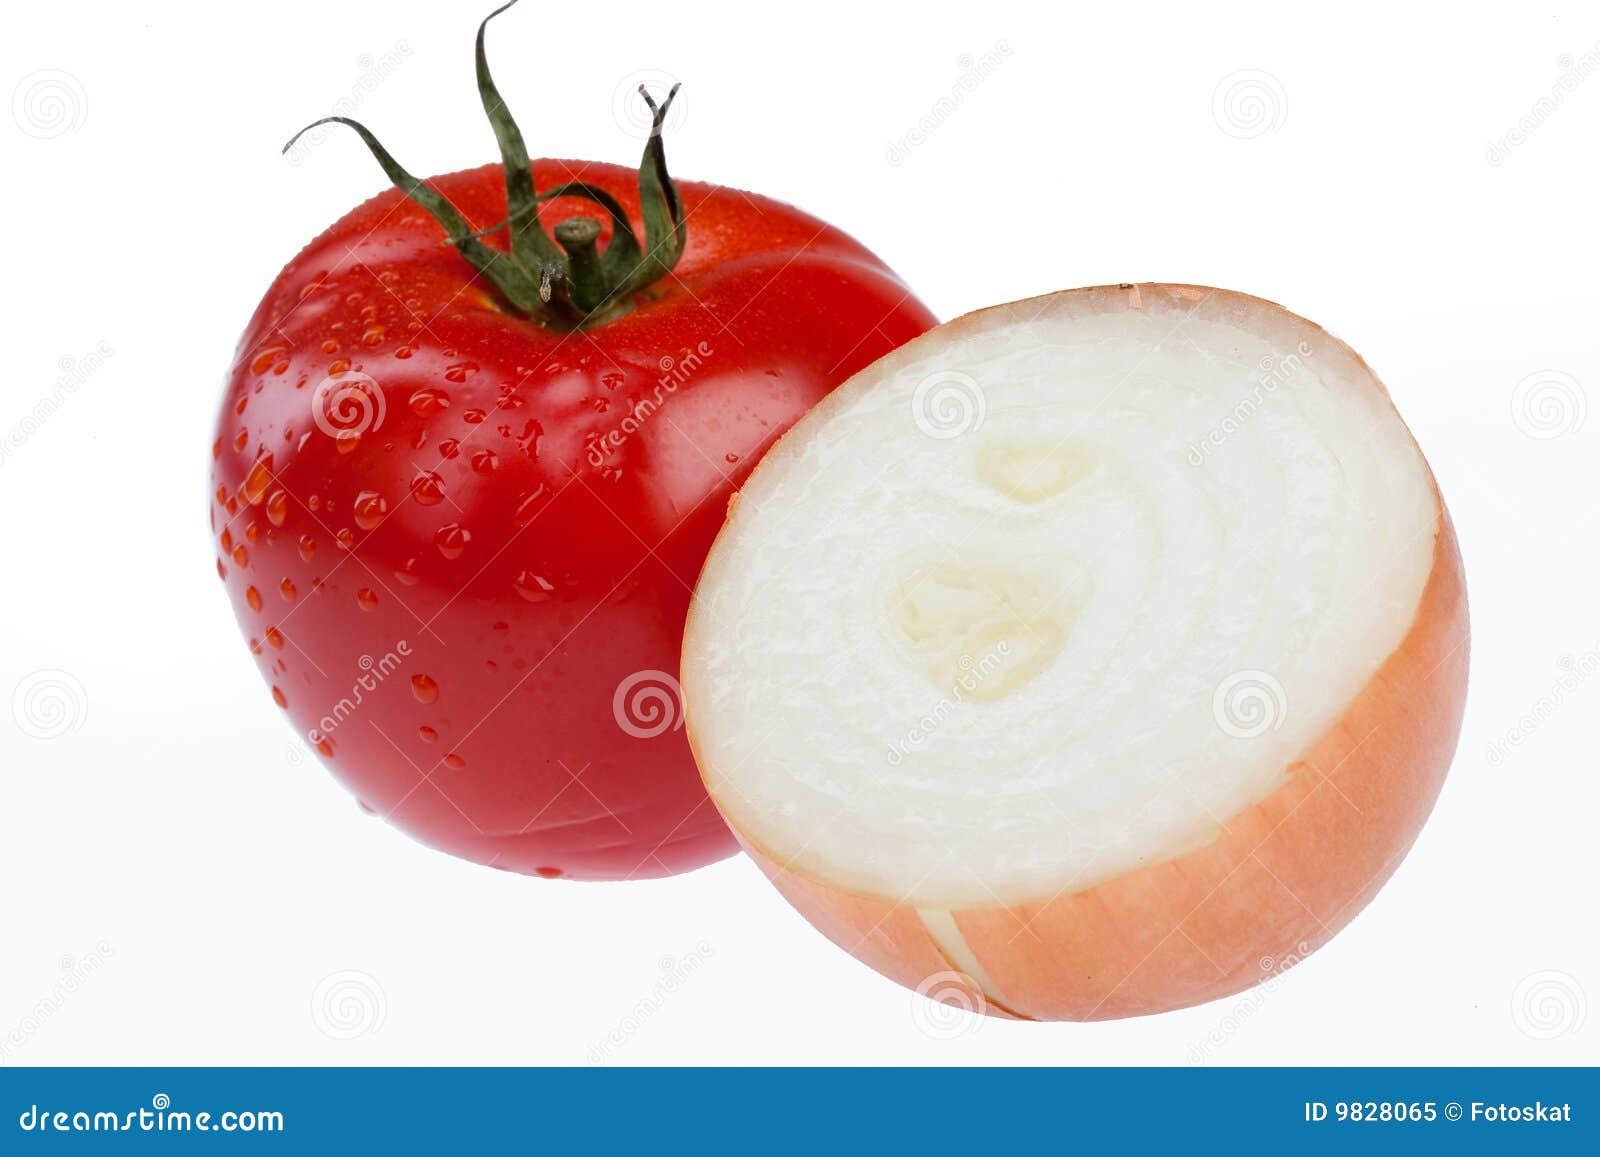 Tomato And Onion Royalty Free Stock Photo - Image: 9828065